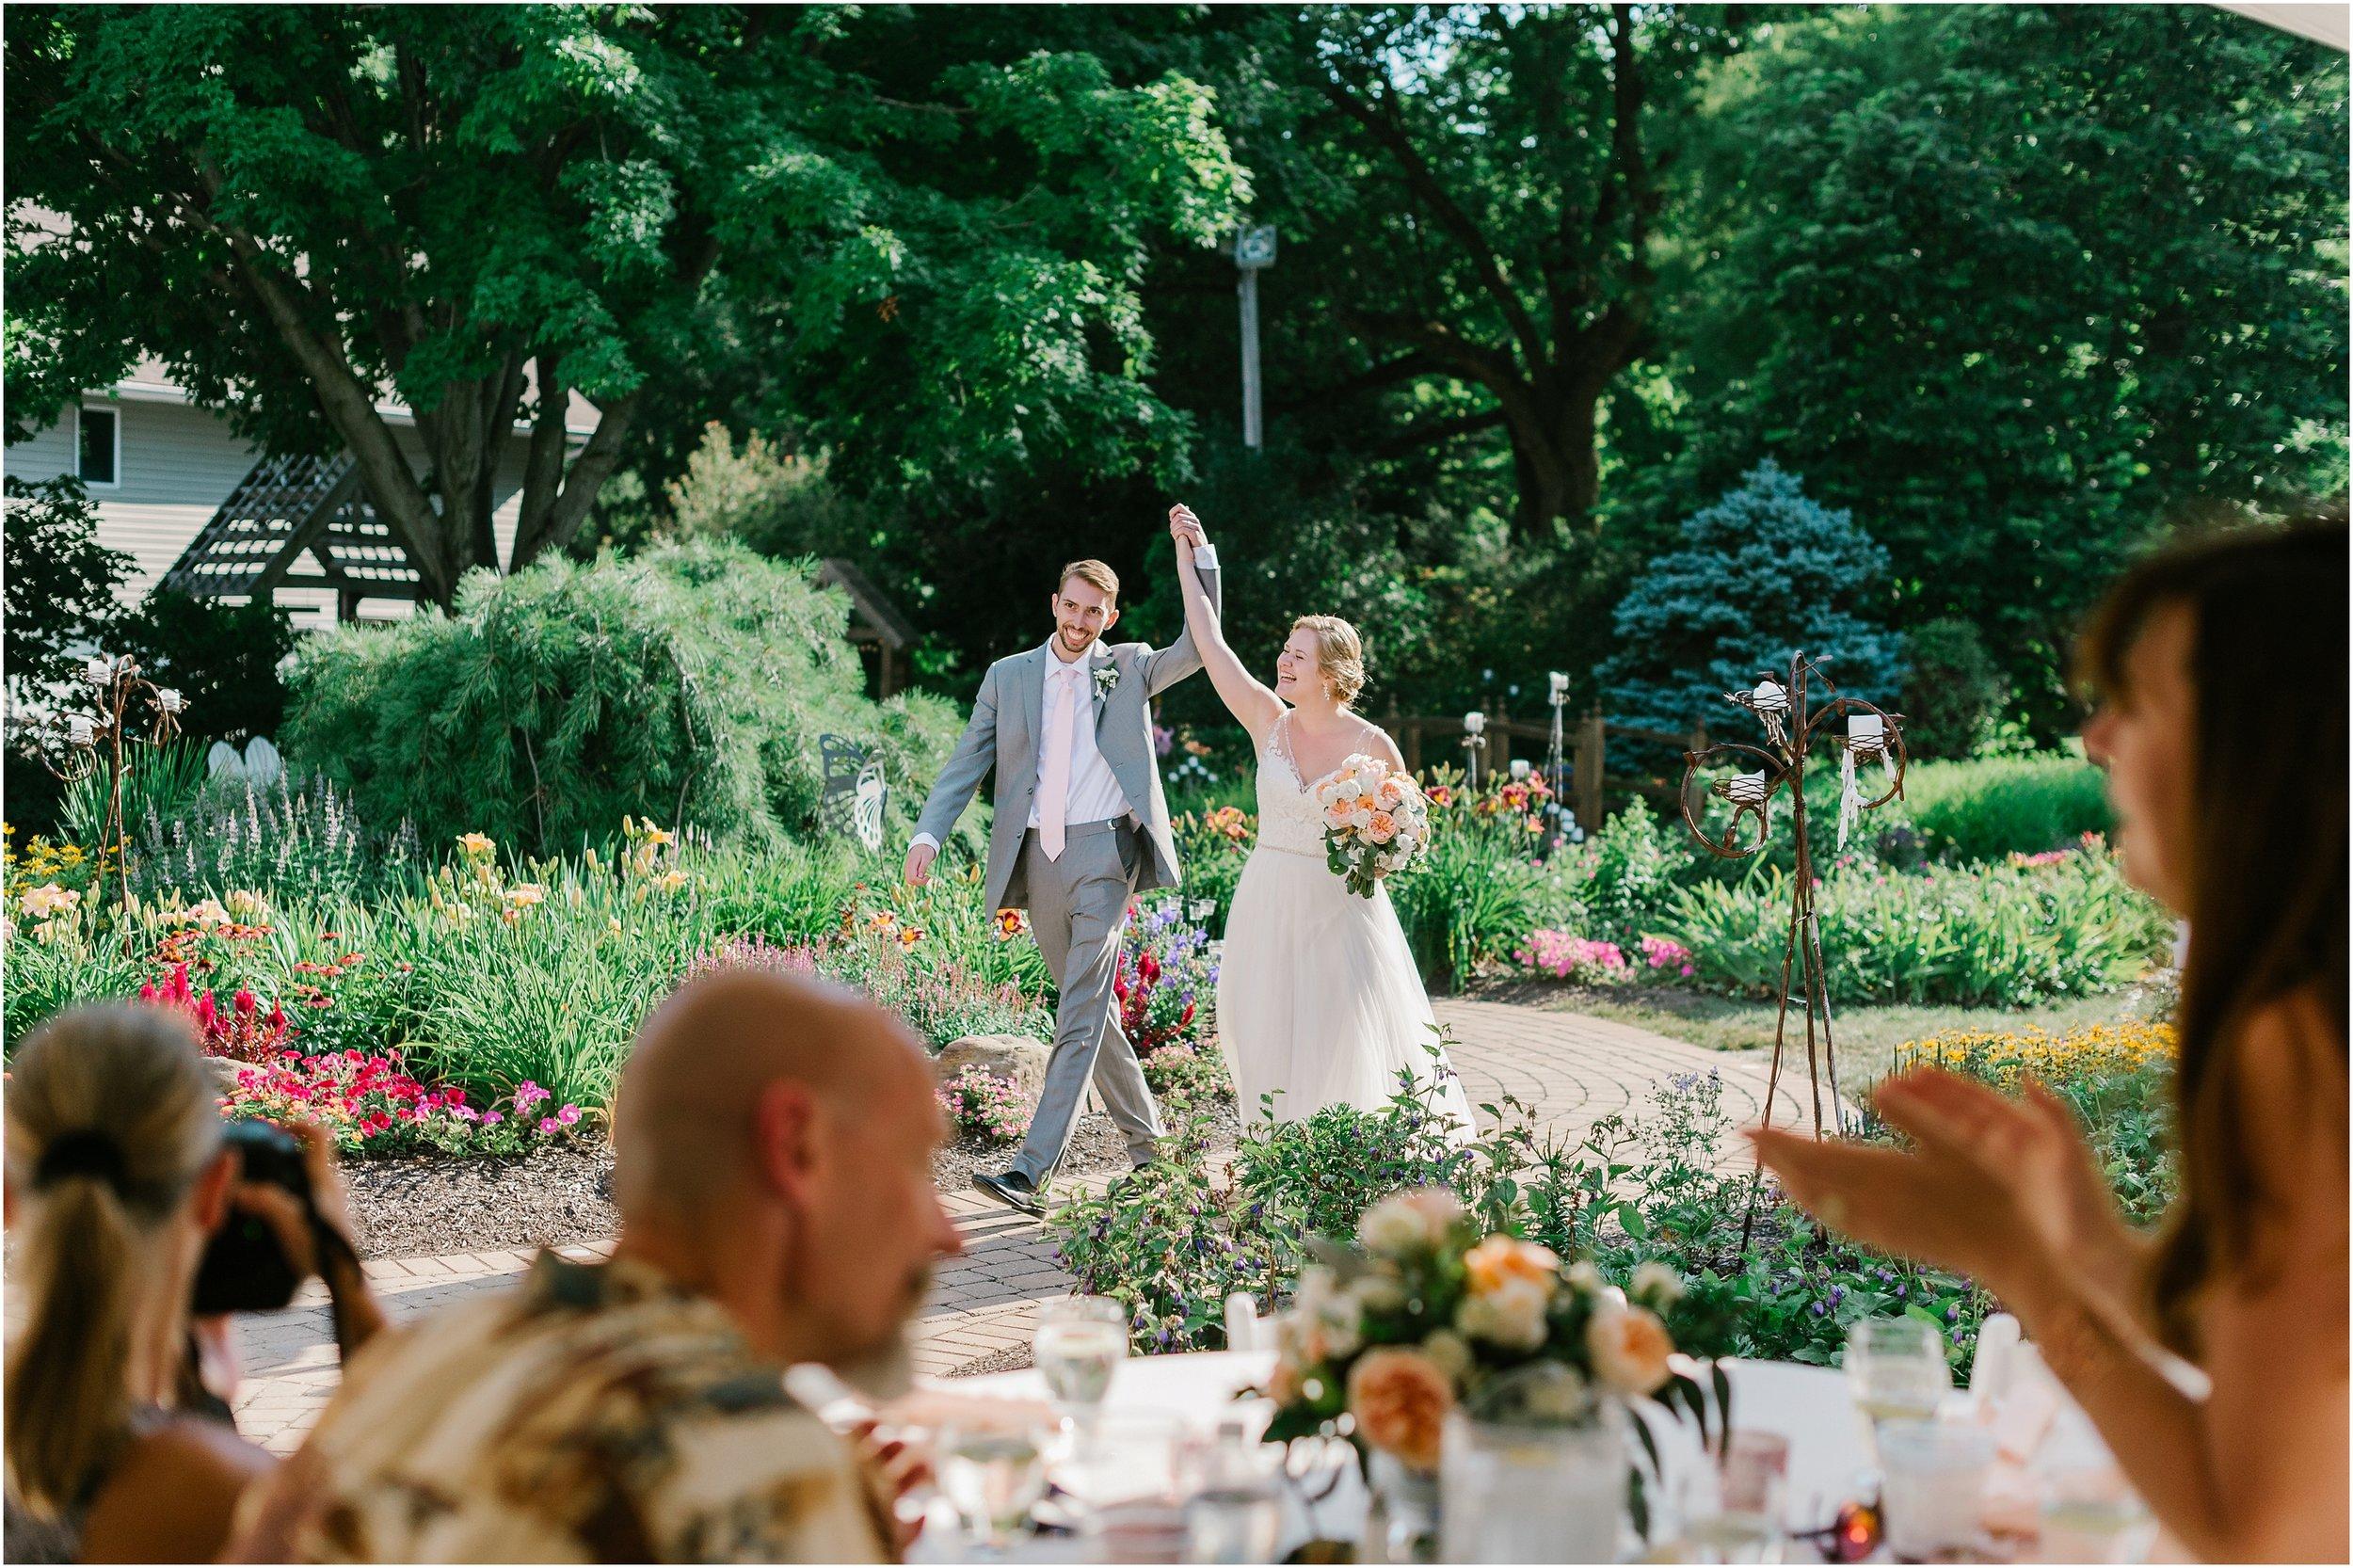 Rebecca_Shehorn_Photography_Indianapolis_Wedding_Photographer_8513.jpg